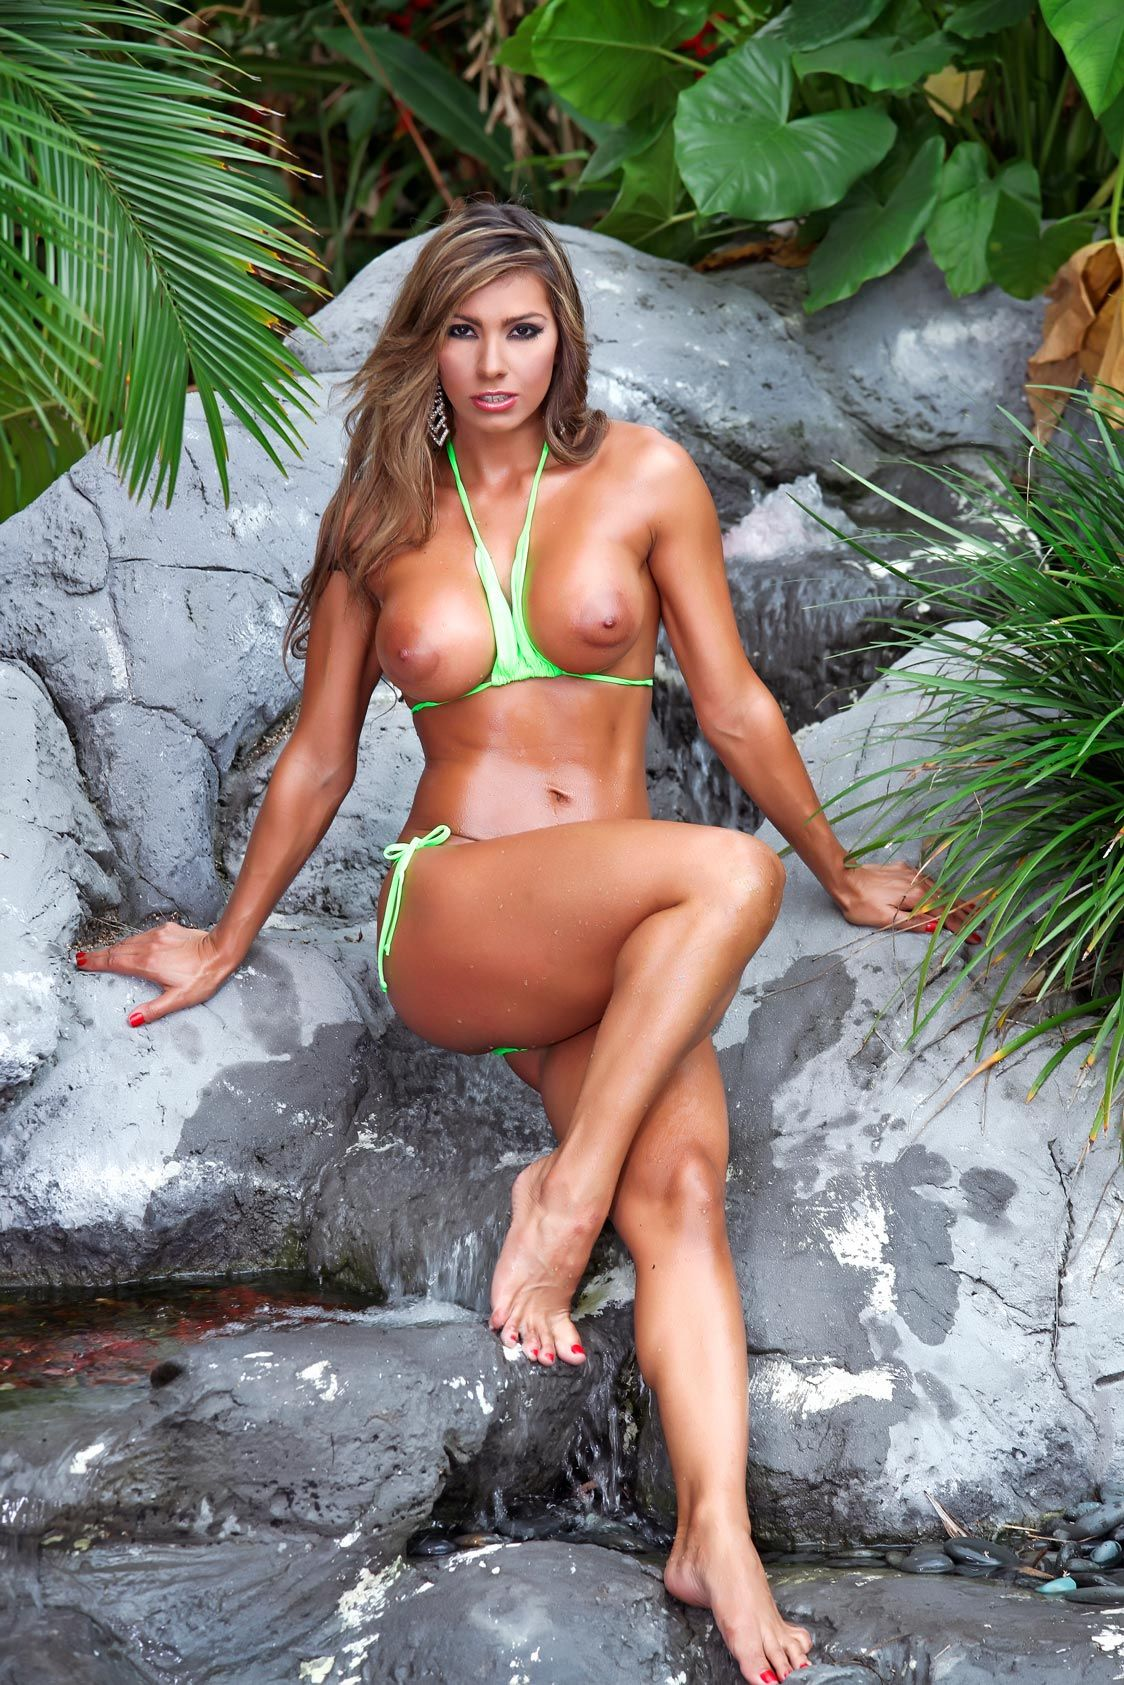 Esperanza Gomez naked (83 pictures) Video, iCloud, butt